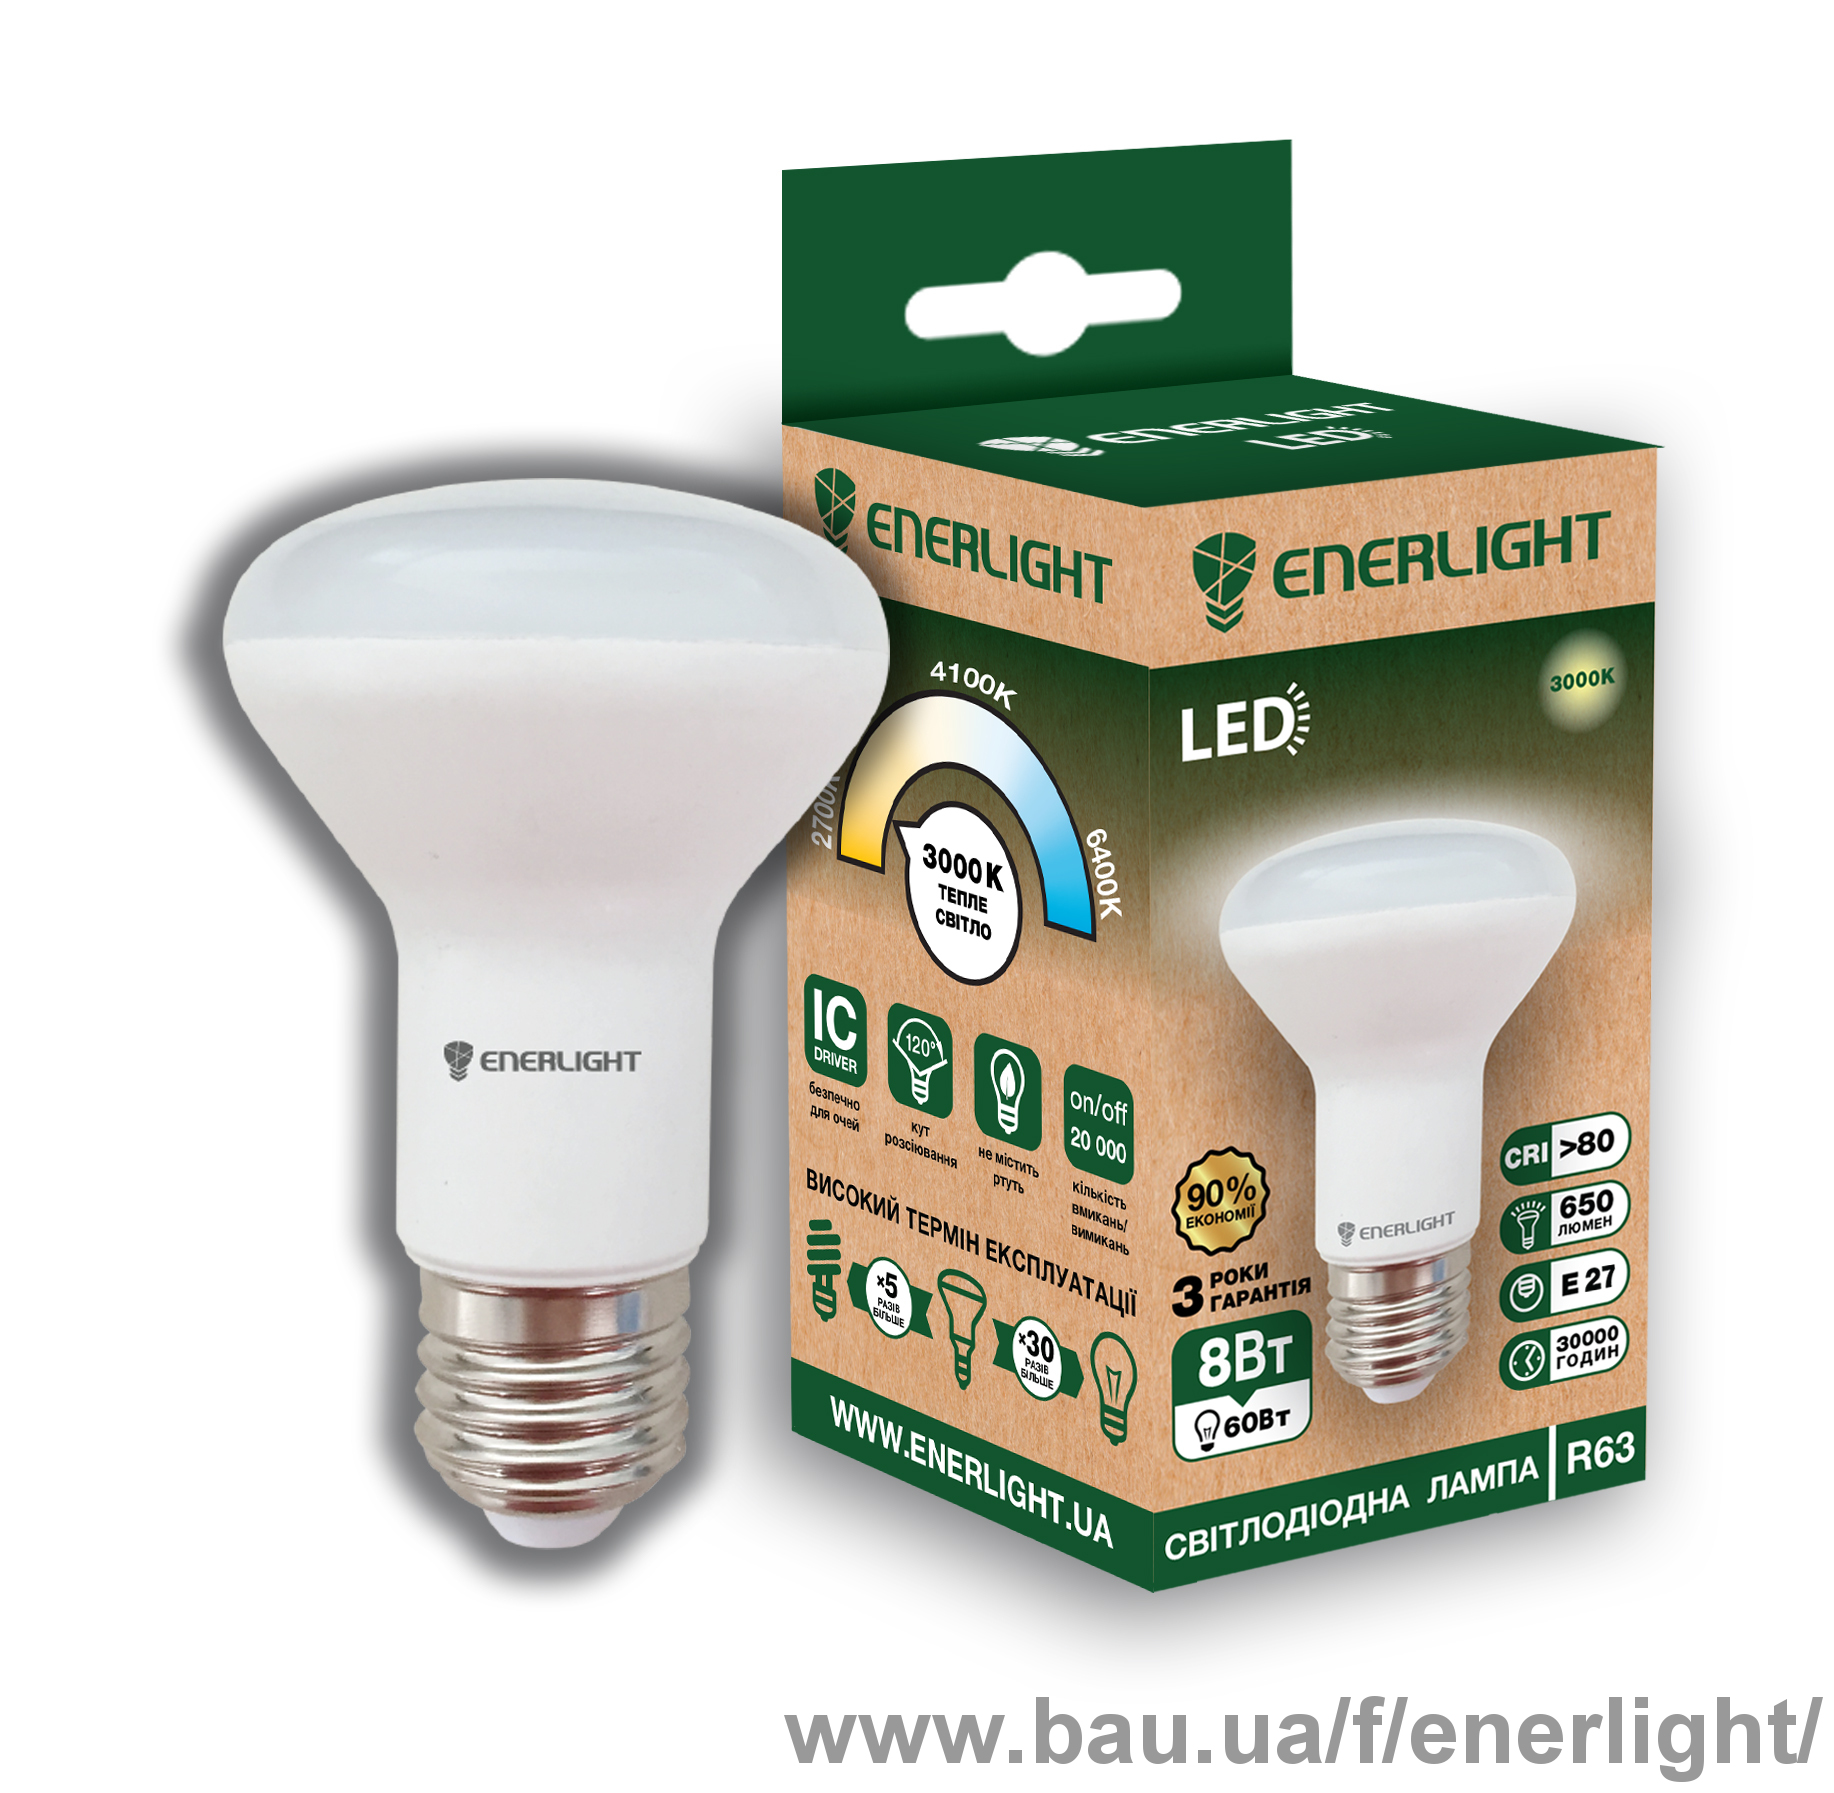 Светодиодная лампа ENERLIGHT R63 8Вт 3000K E27